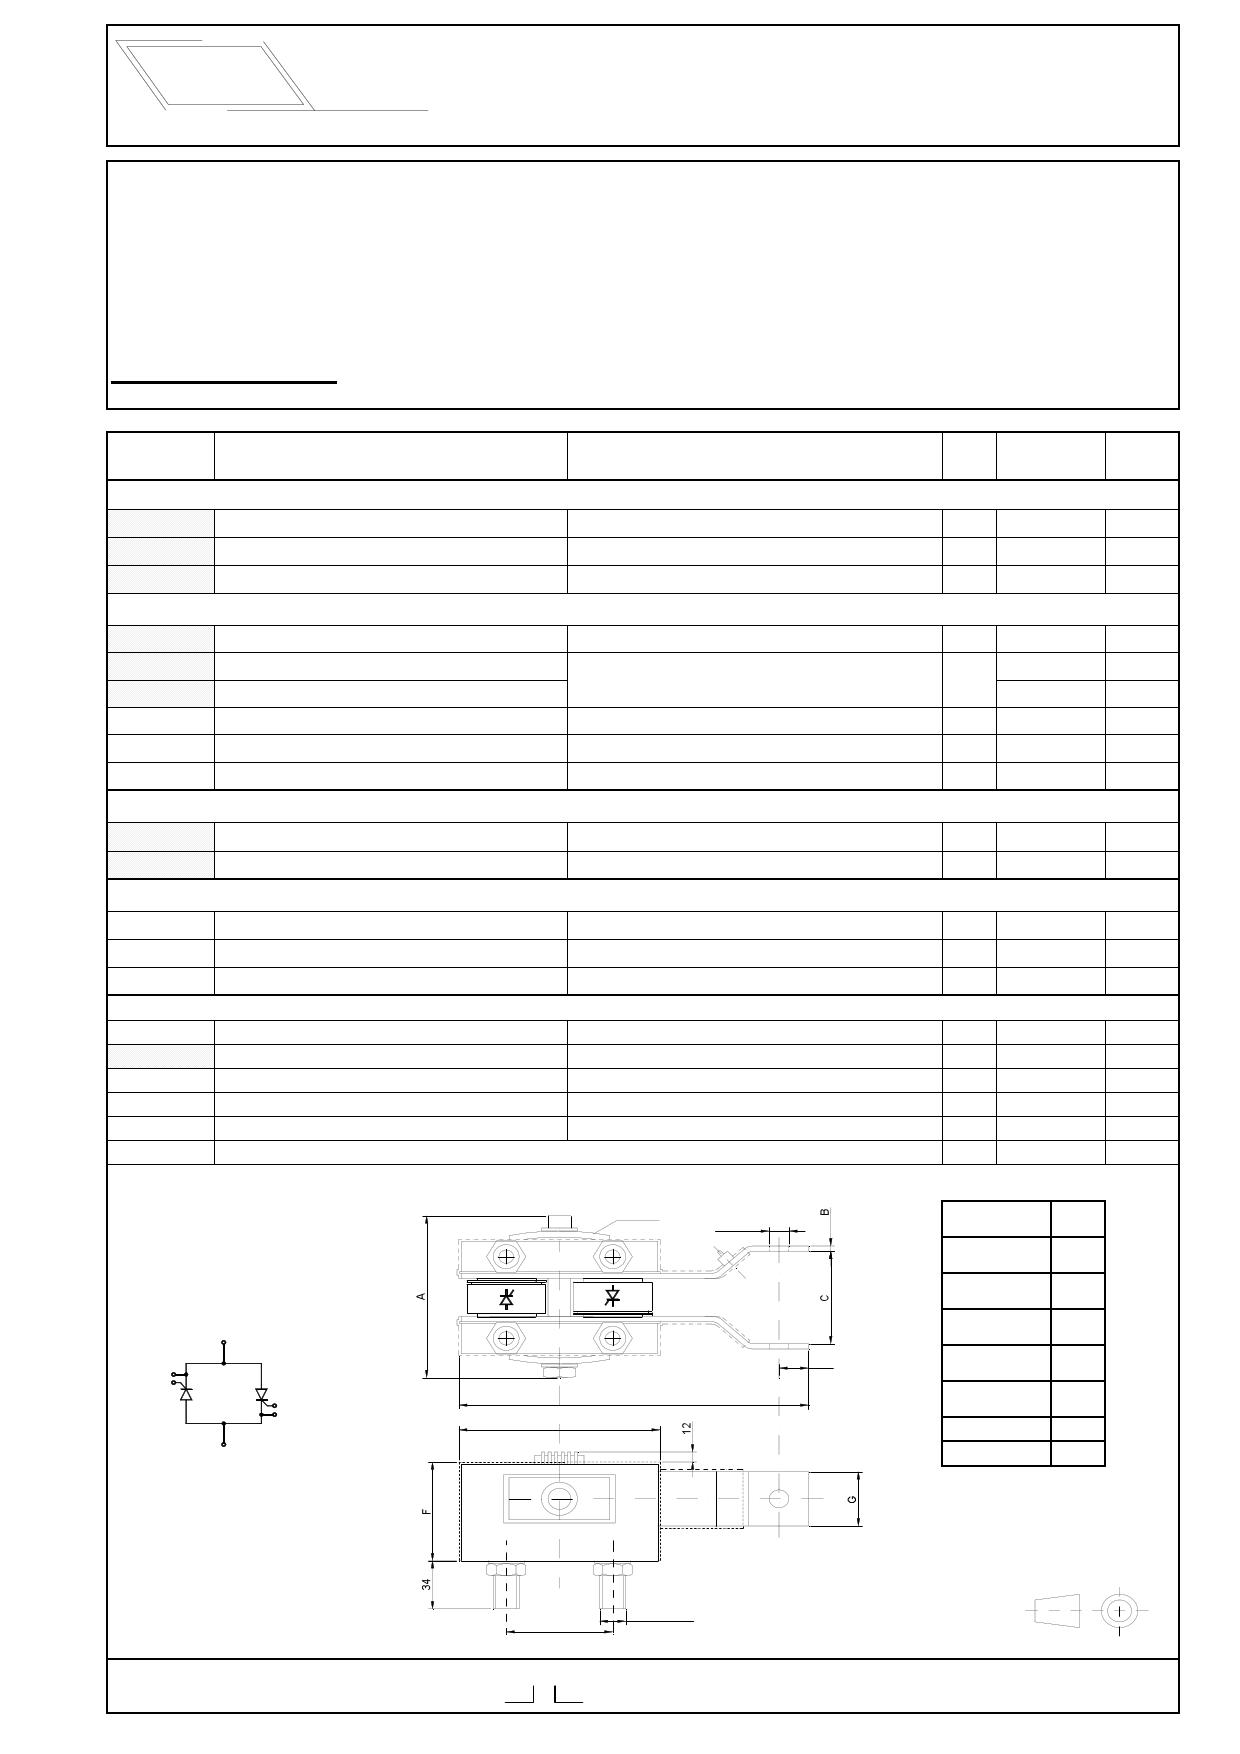 2-2W5I-AT804 دیتاشیت PDF